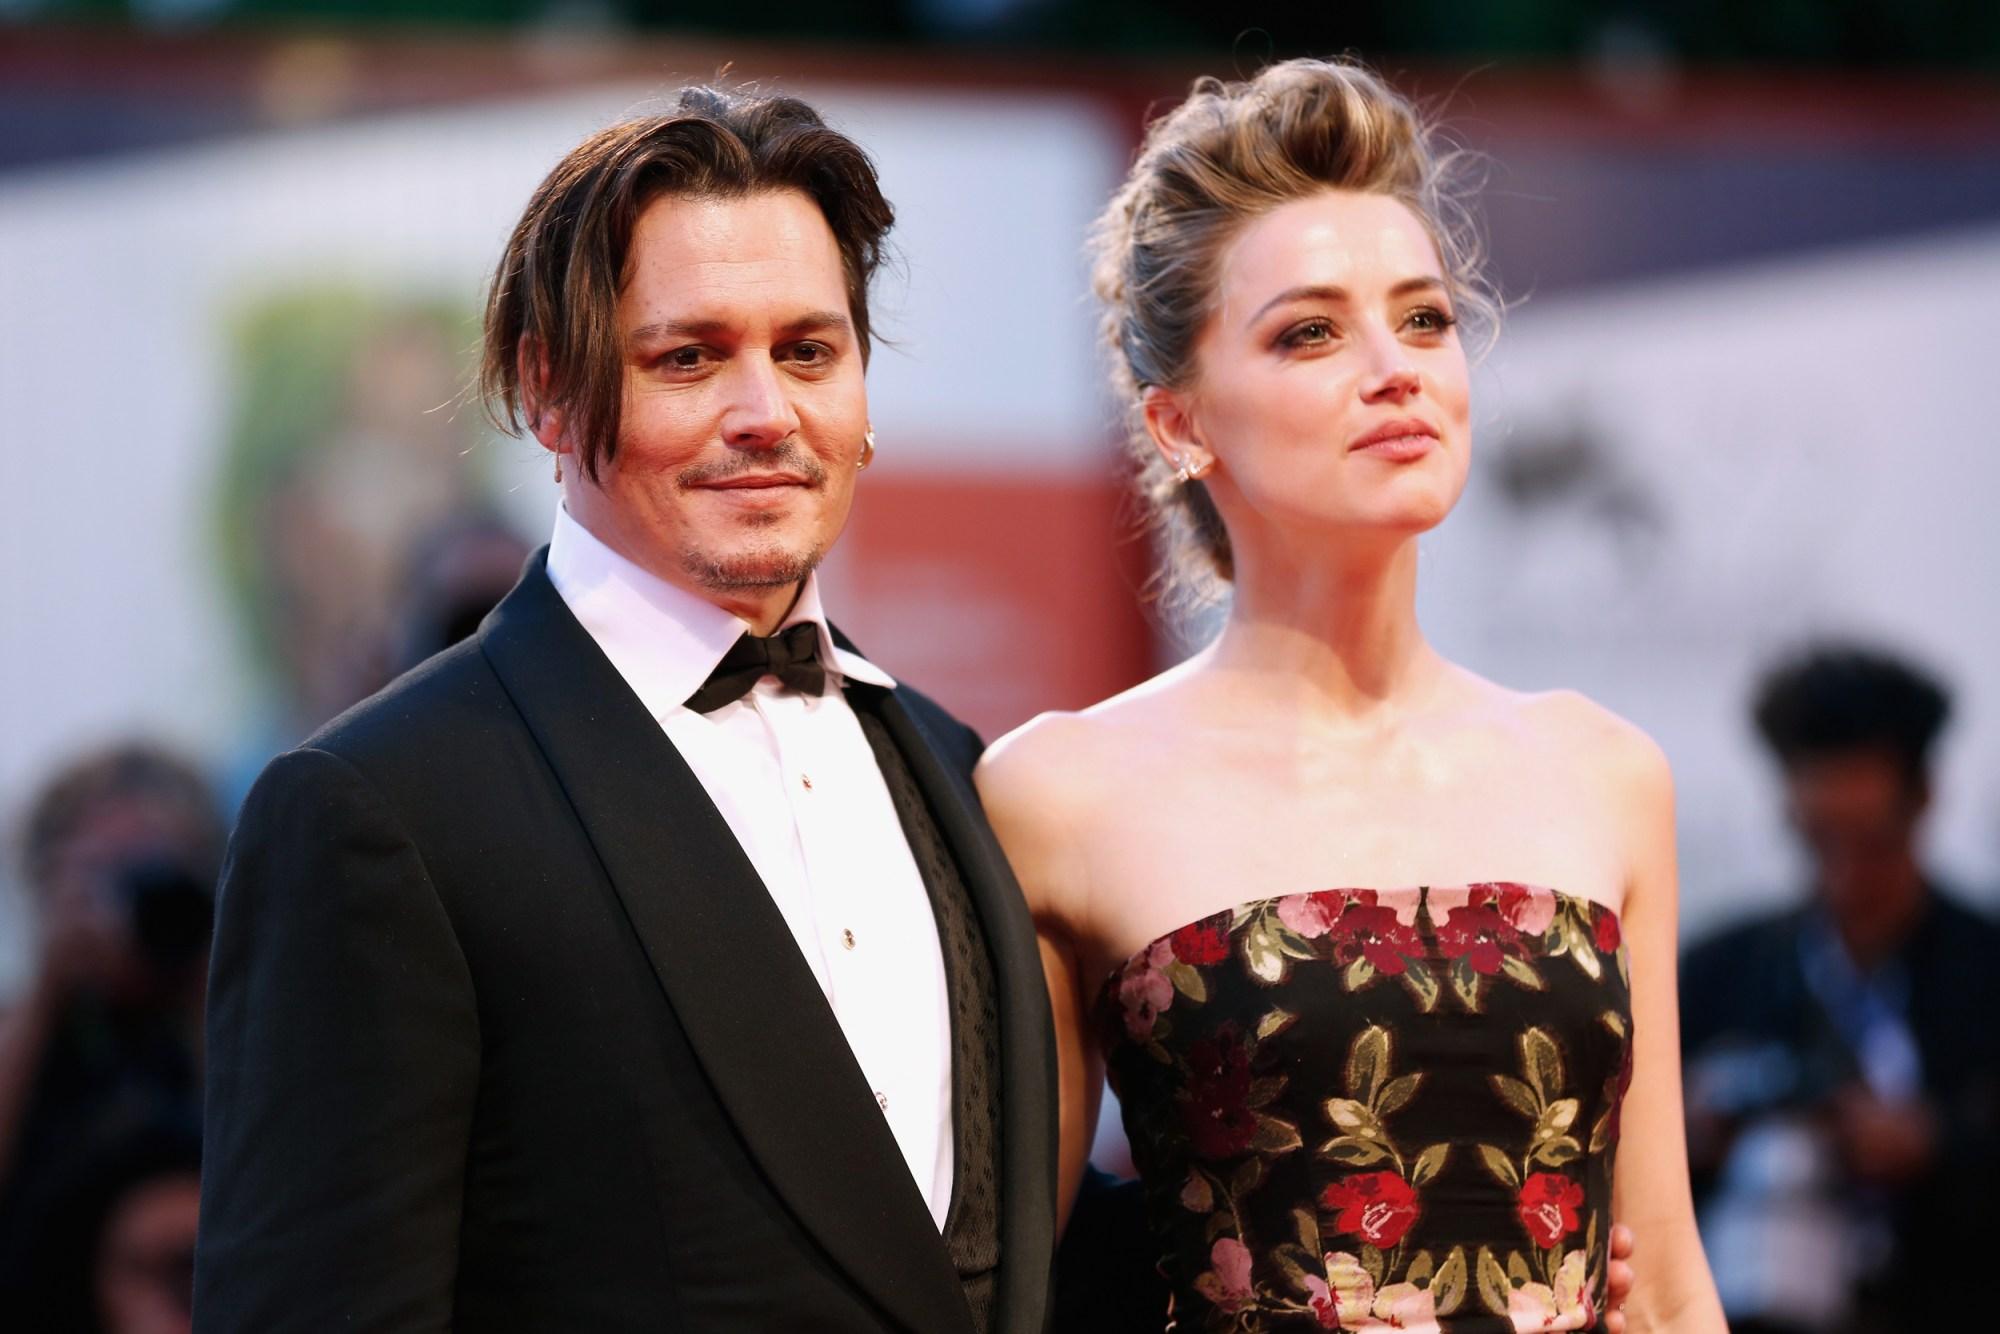 Inside the Johnny Depp court case